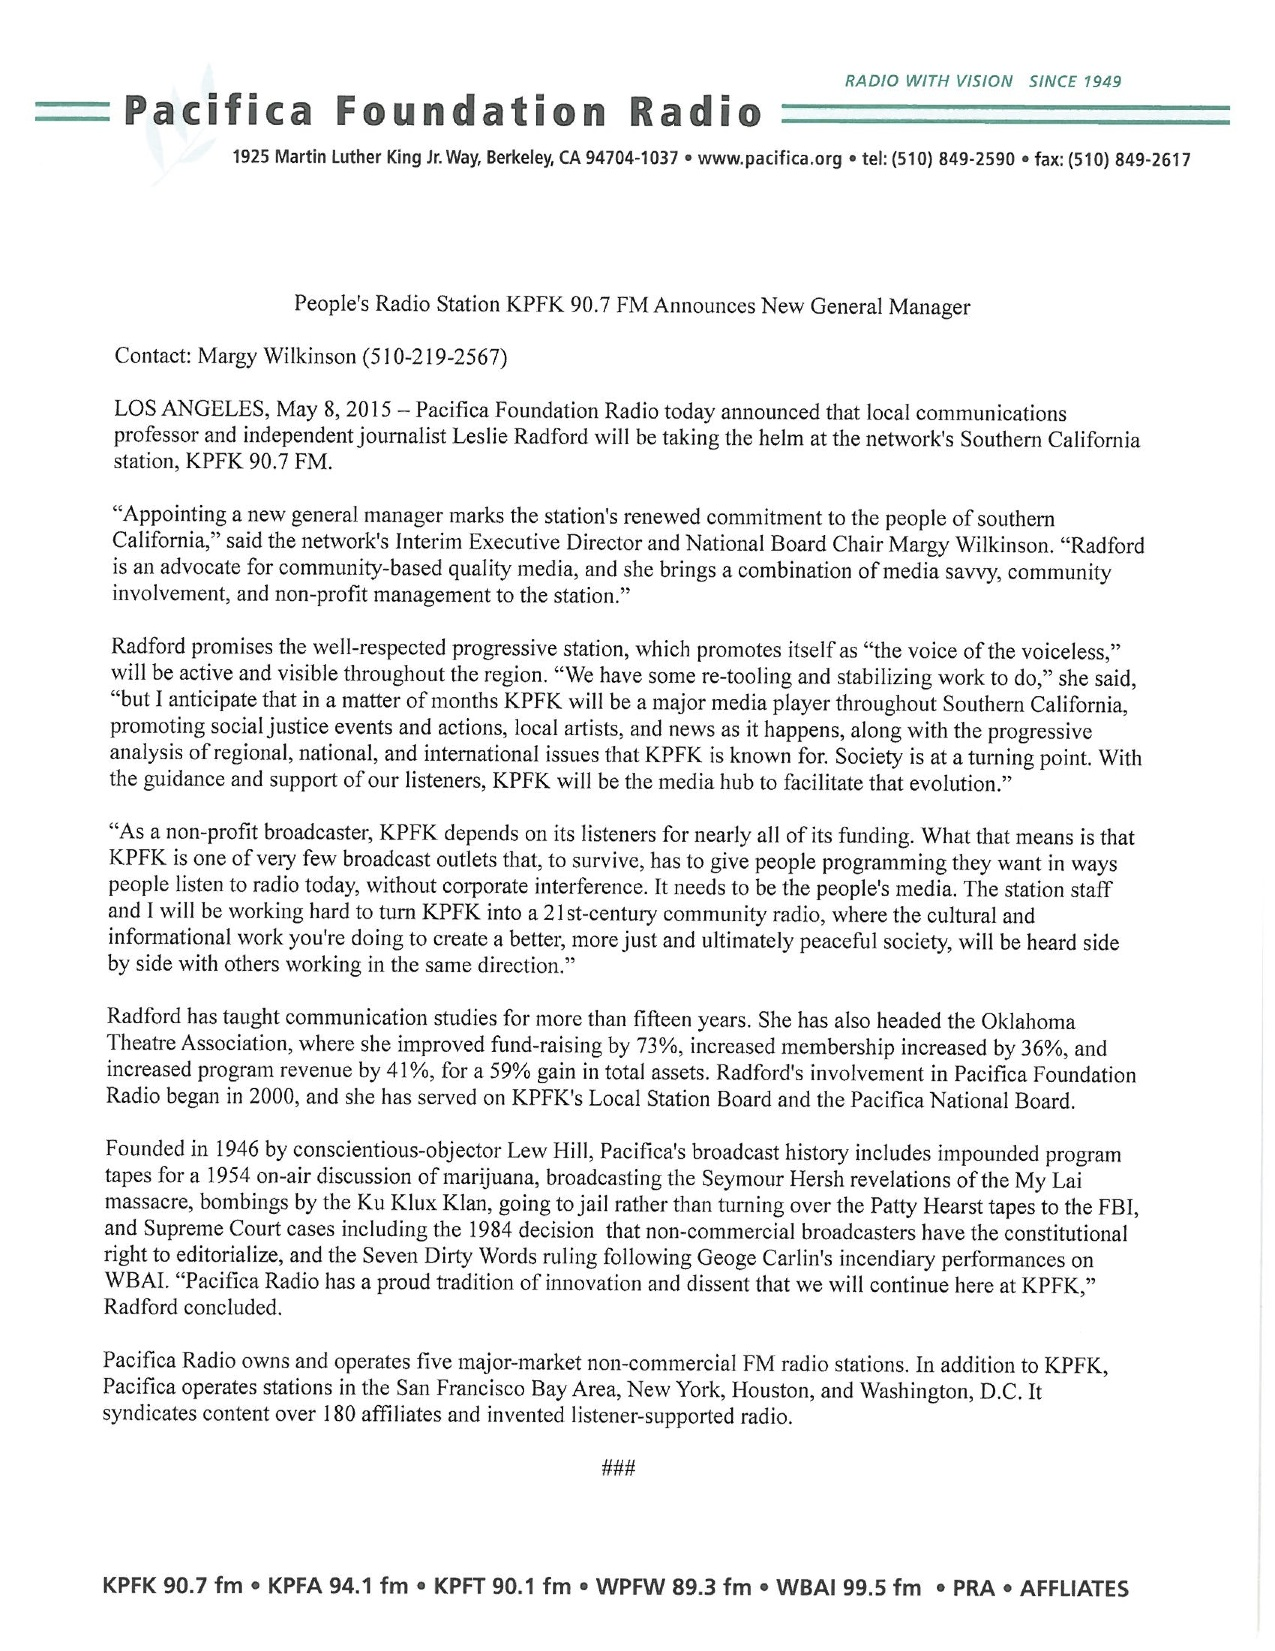 L Radford Press Release 05072015